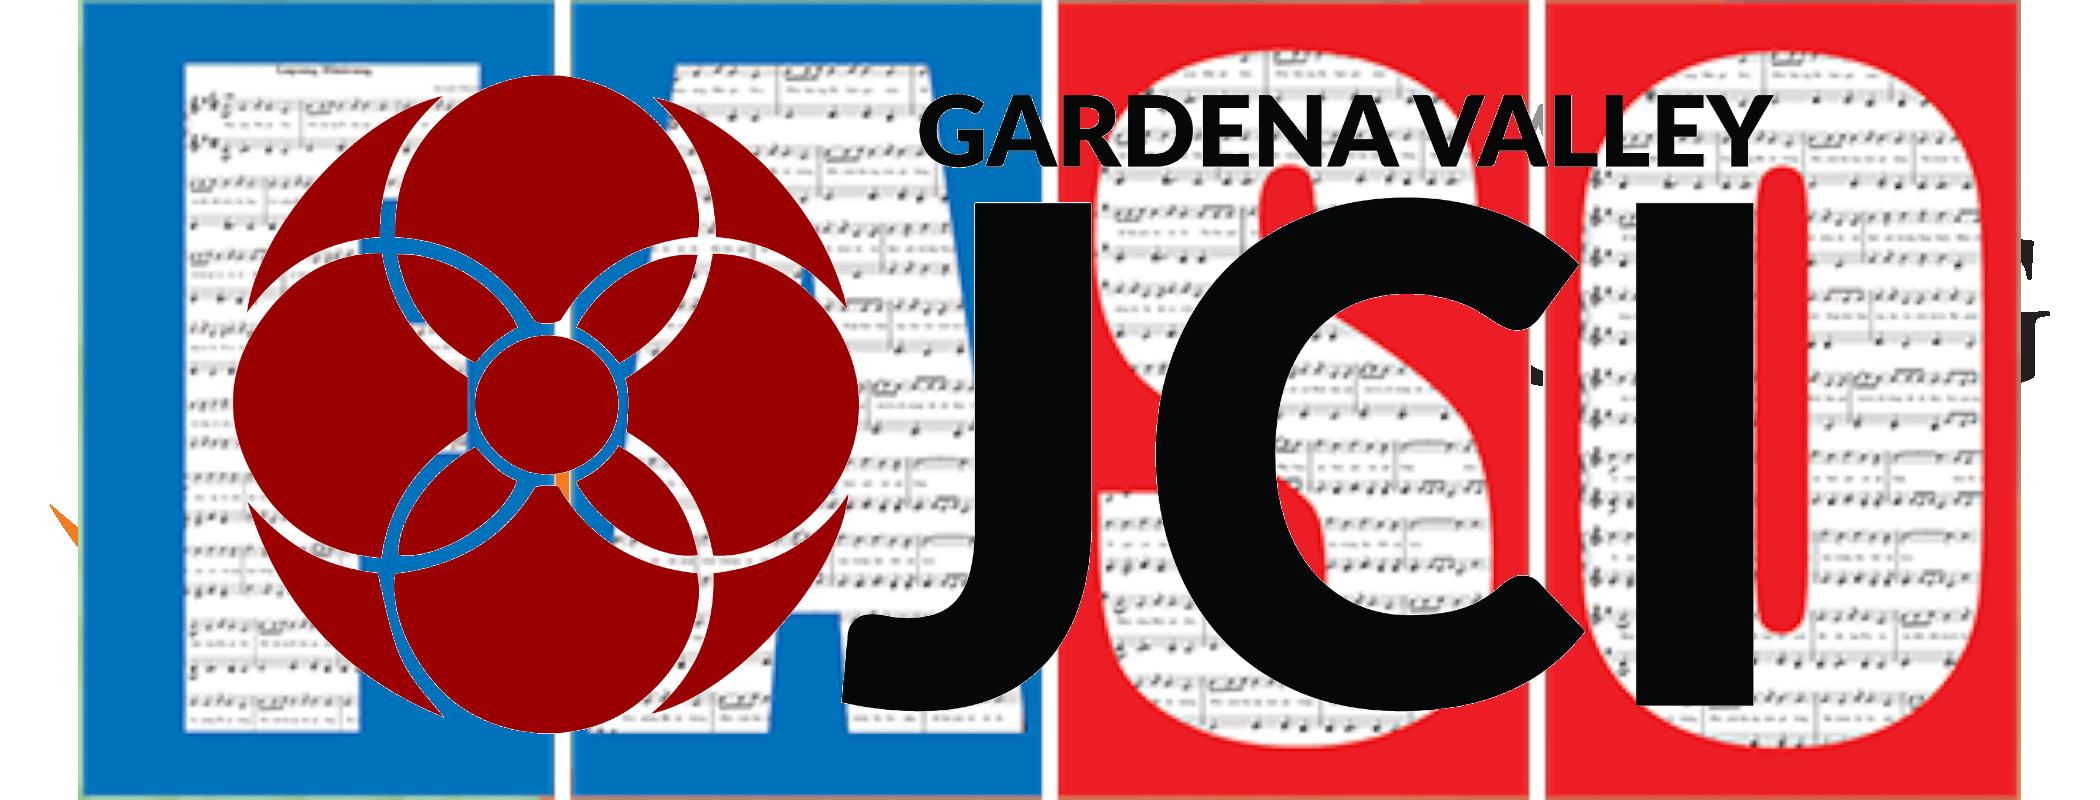 - Gardena ValleyJapanese Cultural Institute1964 W. 162nd StreetGardena, CA 90247jci-gardena.org